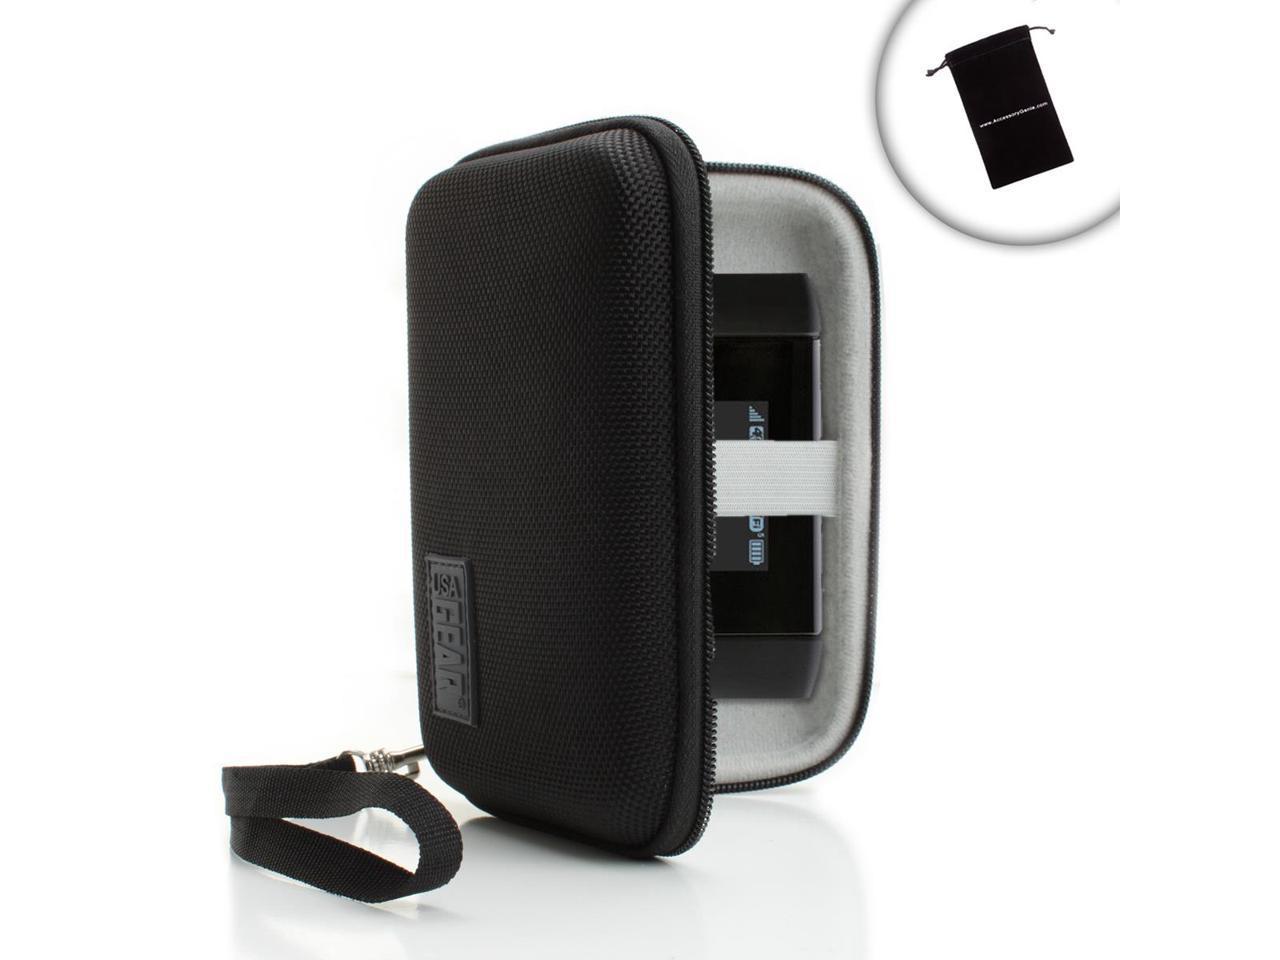 POWE-Tech USB Charging Cable Cord for Verizon Jetpack MiFi 4510L MiFi 5510L Mobile Hotspot